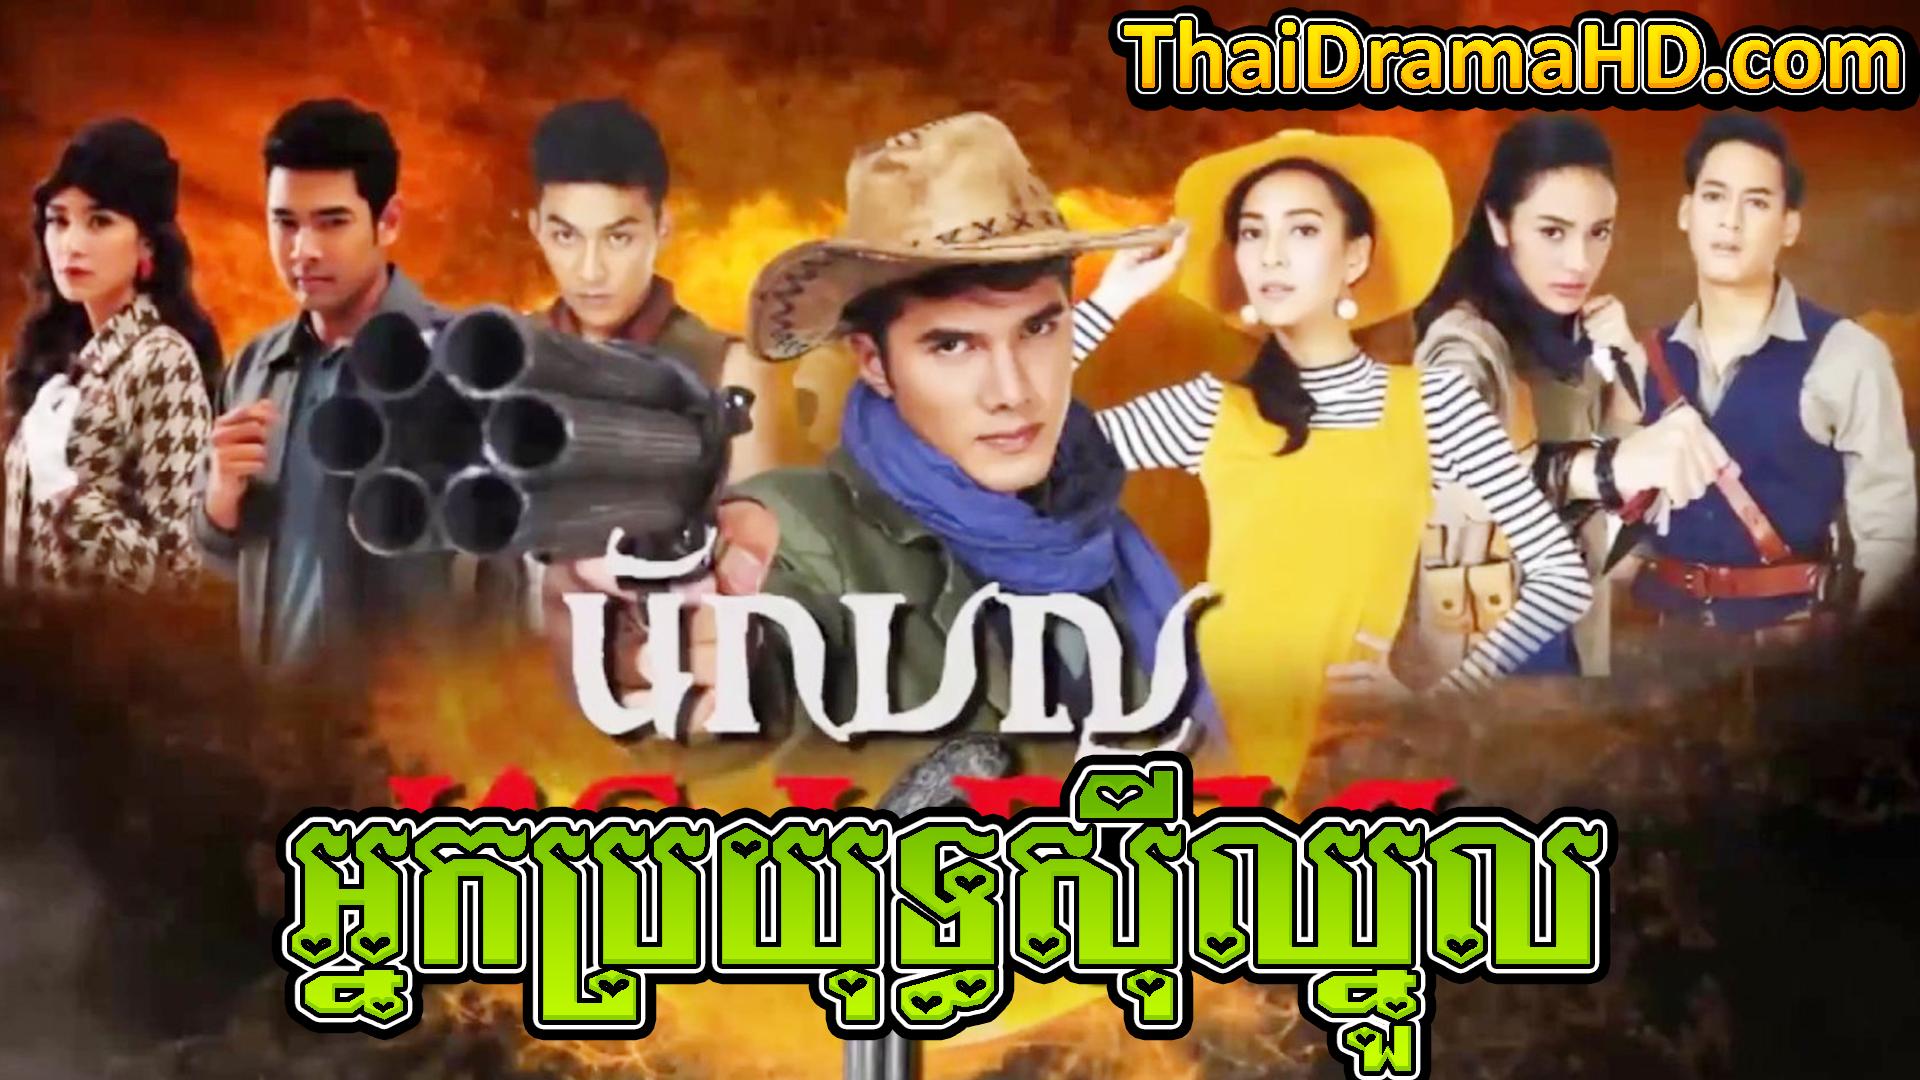 Nak Prayuth Si Chhnoul | Thai Drama | Khmer Movie | Phumikhmer | movie-khmer | video4khmer | khmotions | kolabkhmer | khmer drama | ksdrama | cookingtips | roscheat | khmertimeskh | khmerkomsan | phumi7 | merlkon | film2us | movie2kh | sweetdrama | khmercitylove | khreplay | tvb cambodia drama | ckh7 | srokthai | phumimedia | phumi8 | khmer avenue | khmer search | Soyo | khmerfans